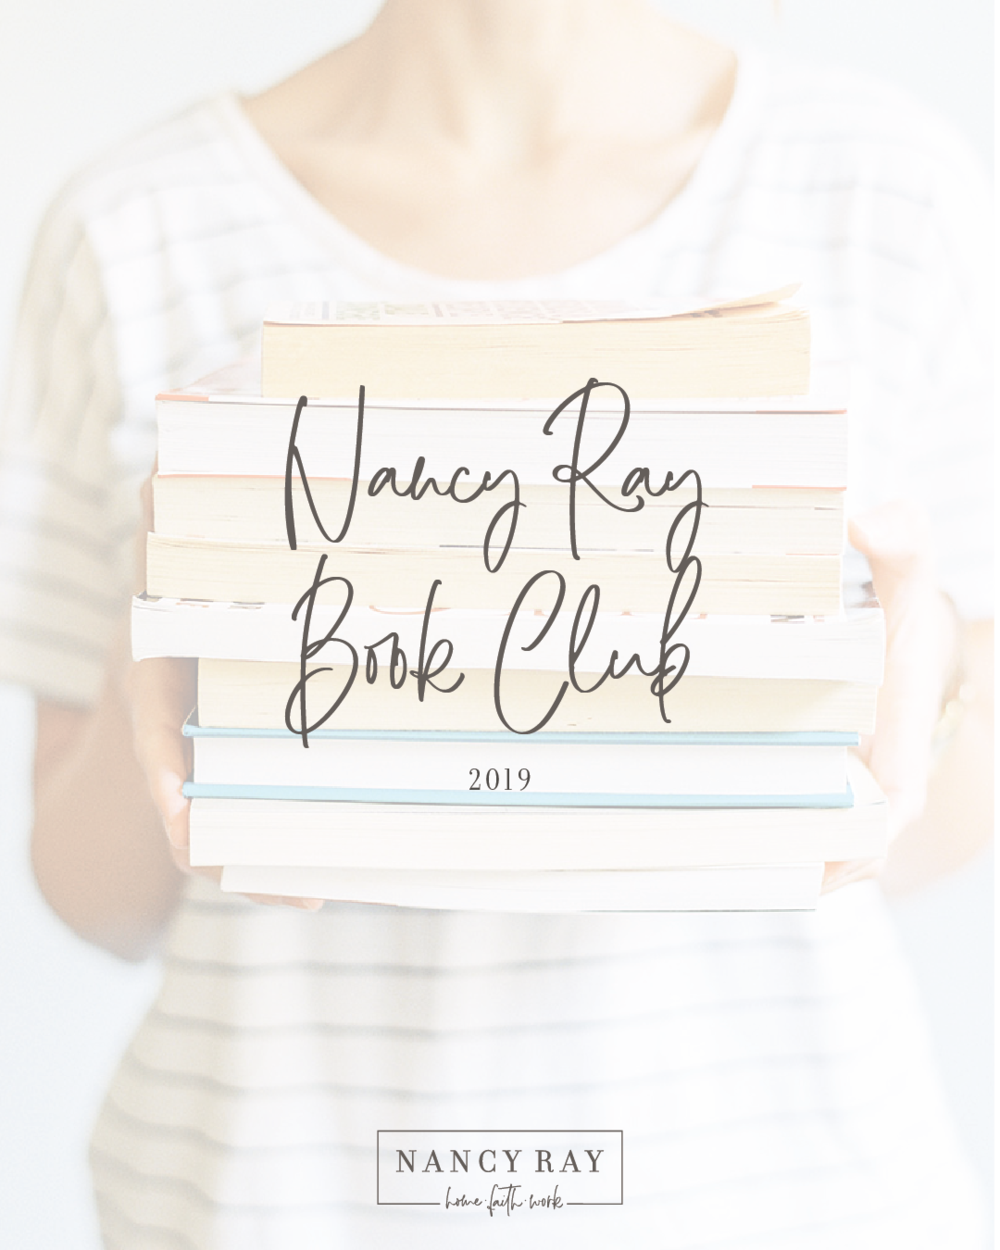 Nancy Ray Book Club 2019